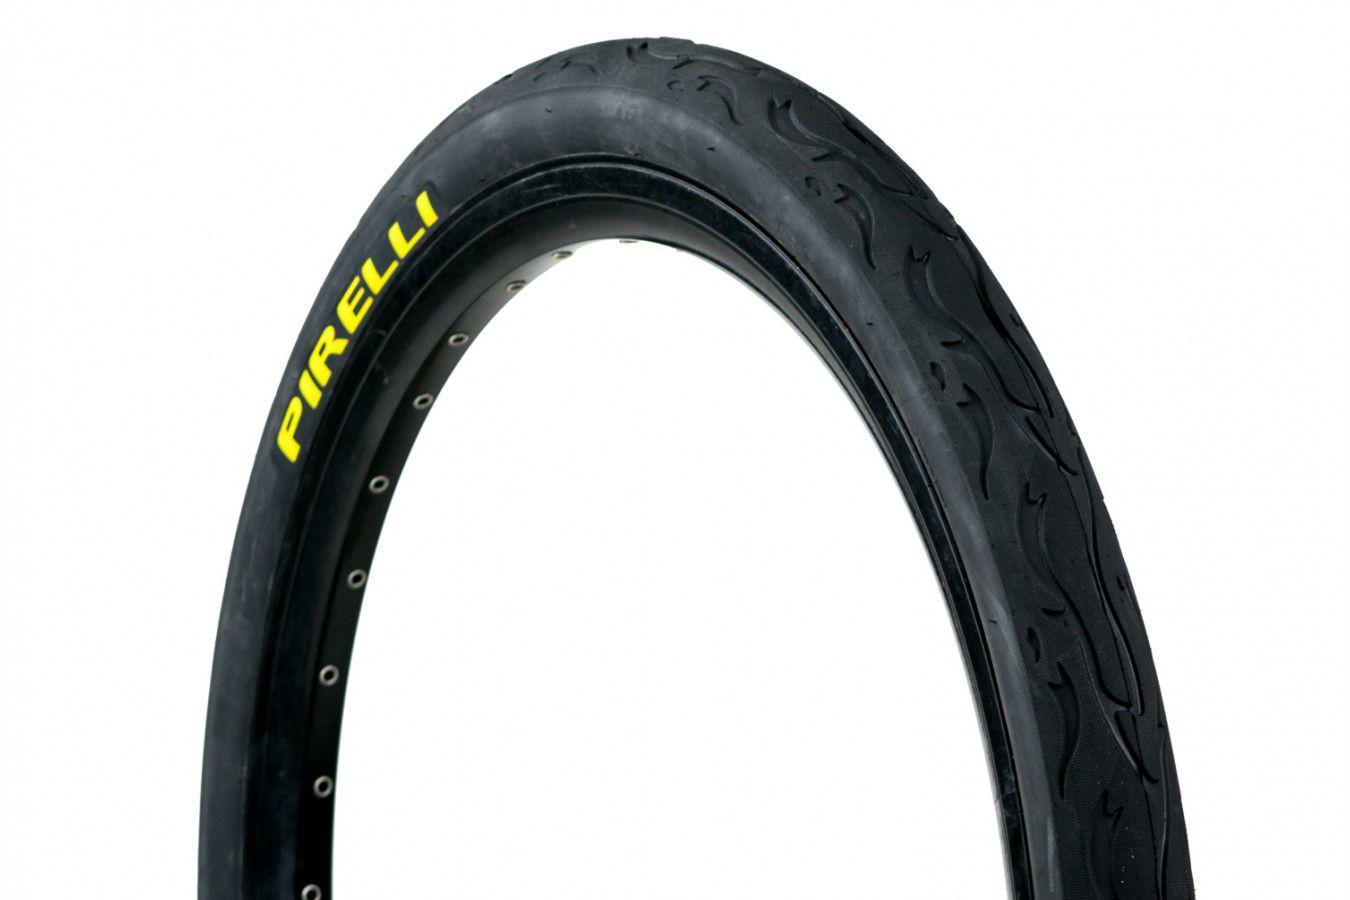 Pneu Pirelli 26 x 2.125 Tornado Beta Arame Preto 45 Psi